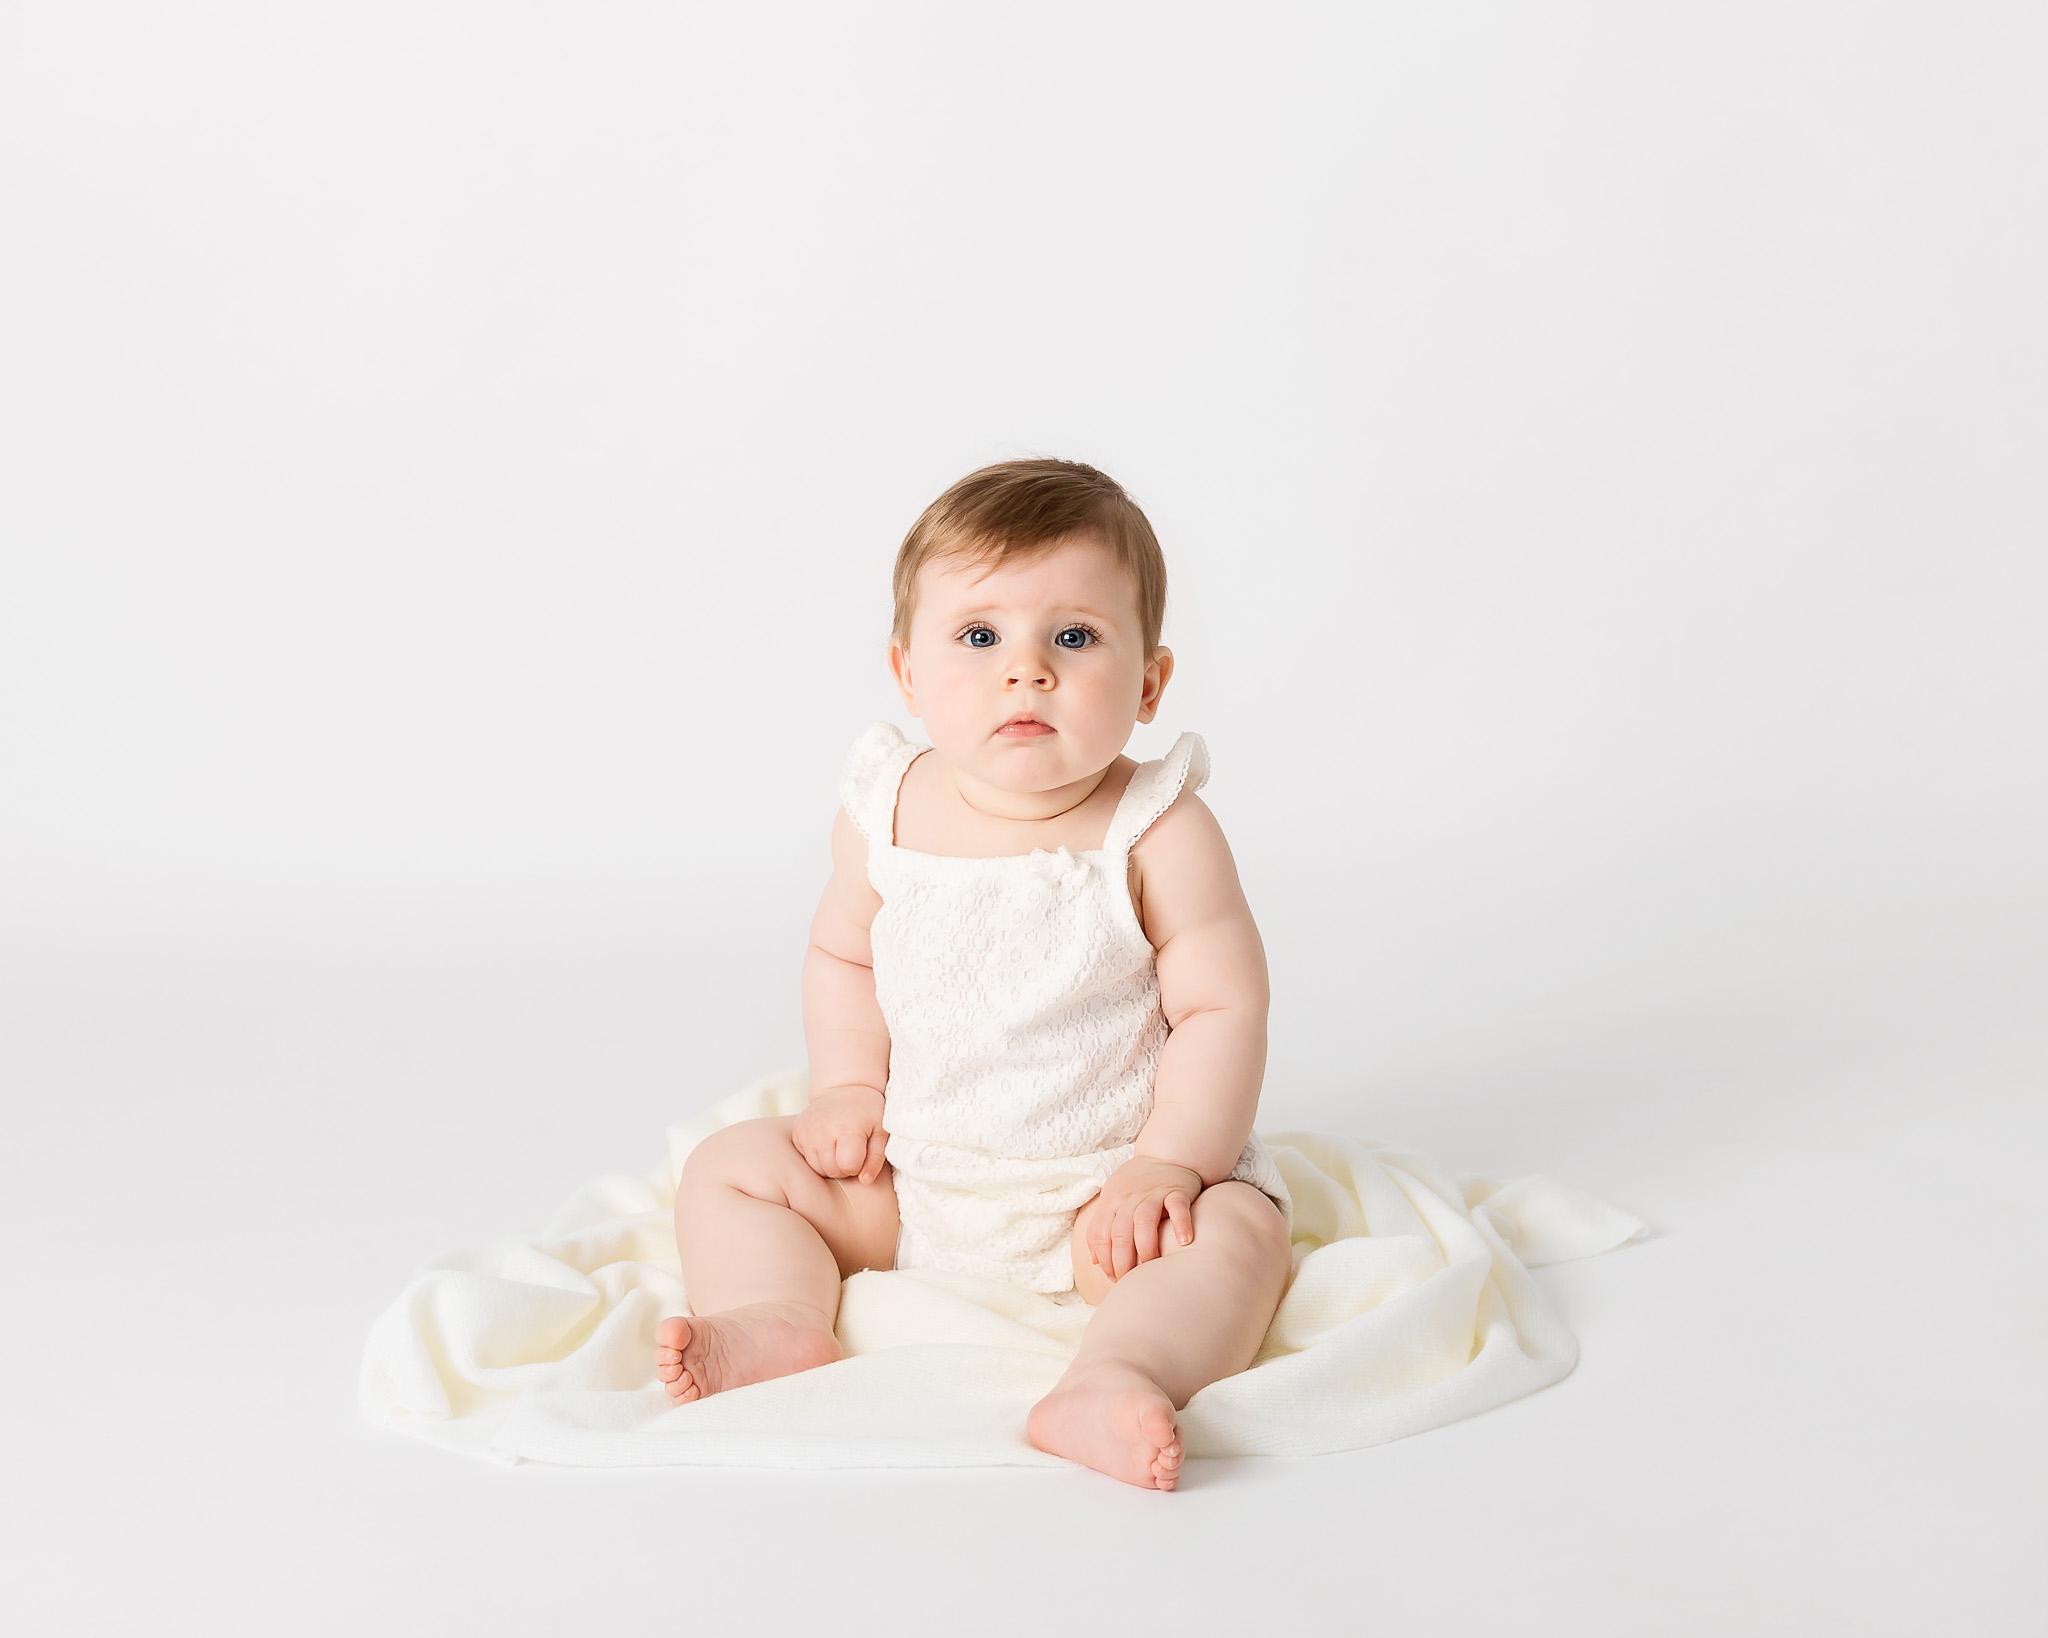 baby photography banchory aberdeenshire photographer-1.jpg